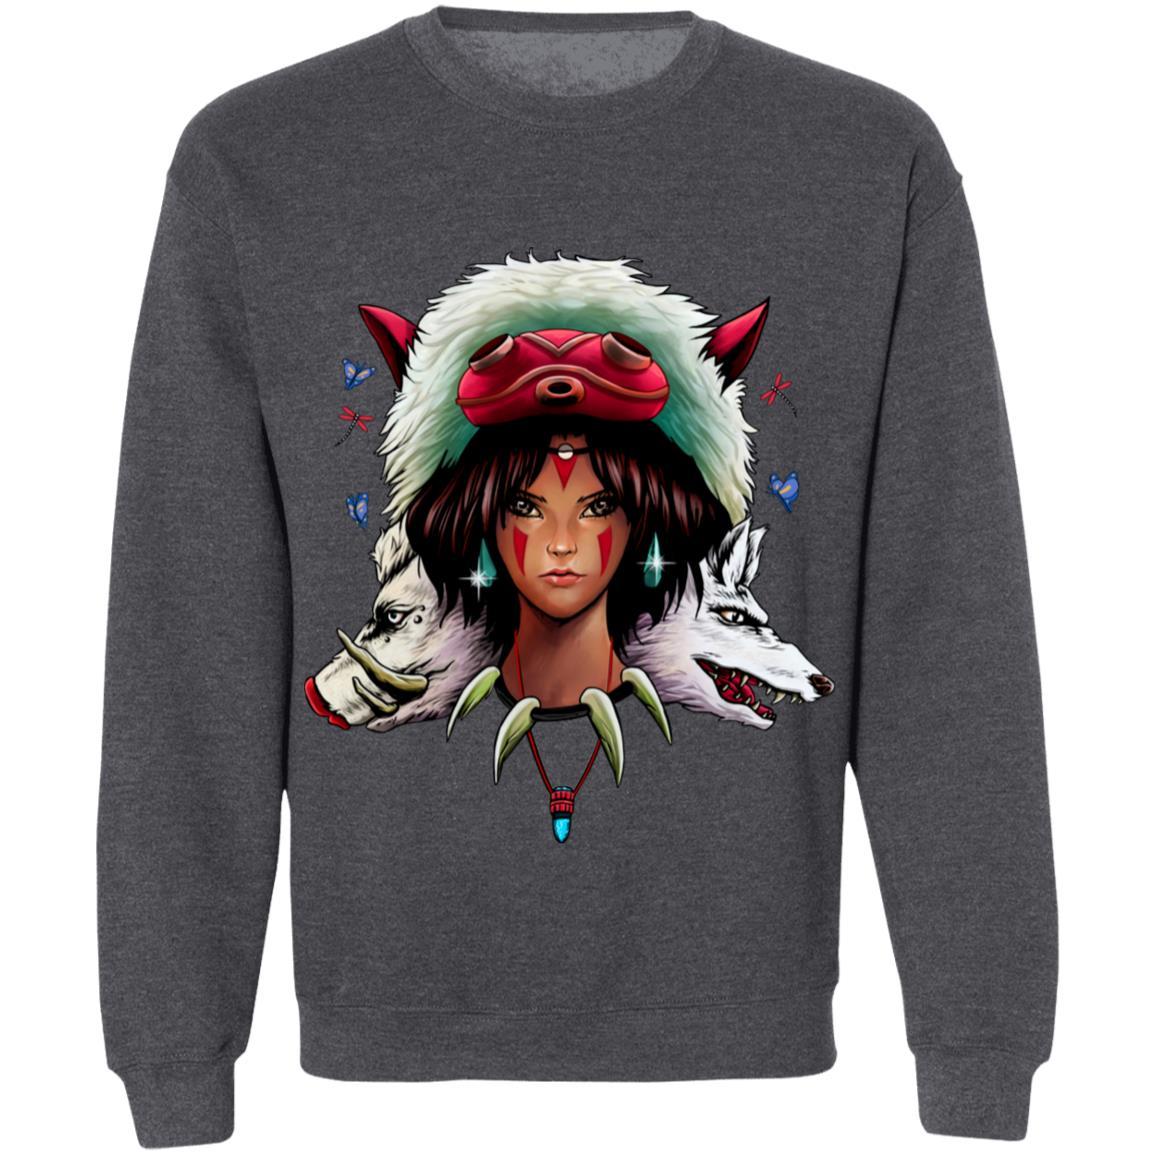 Mononoke: The Wolf Princess Sweatshirt